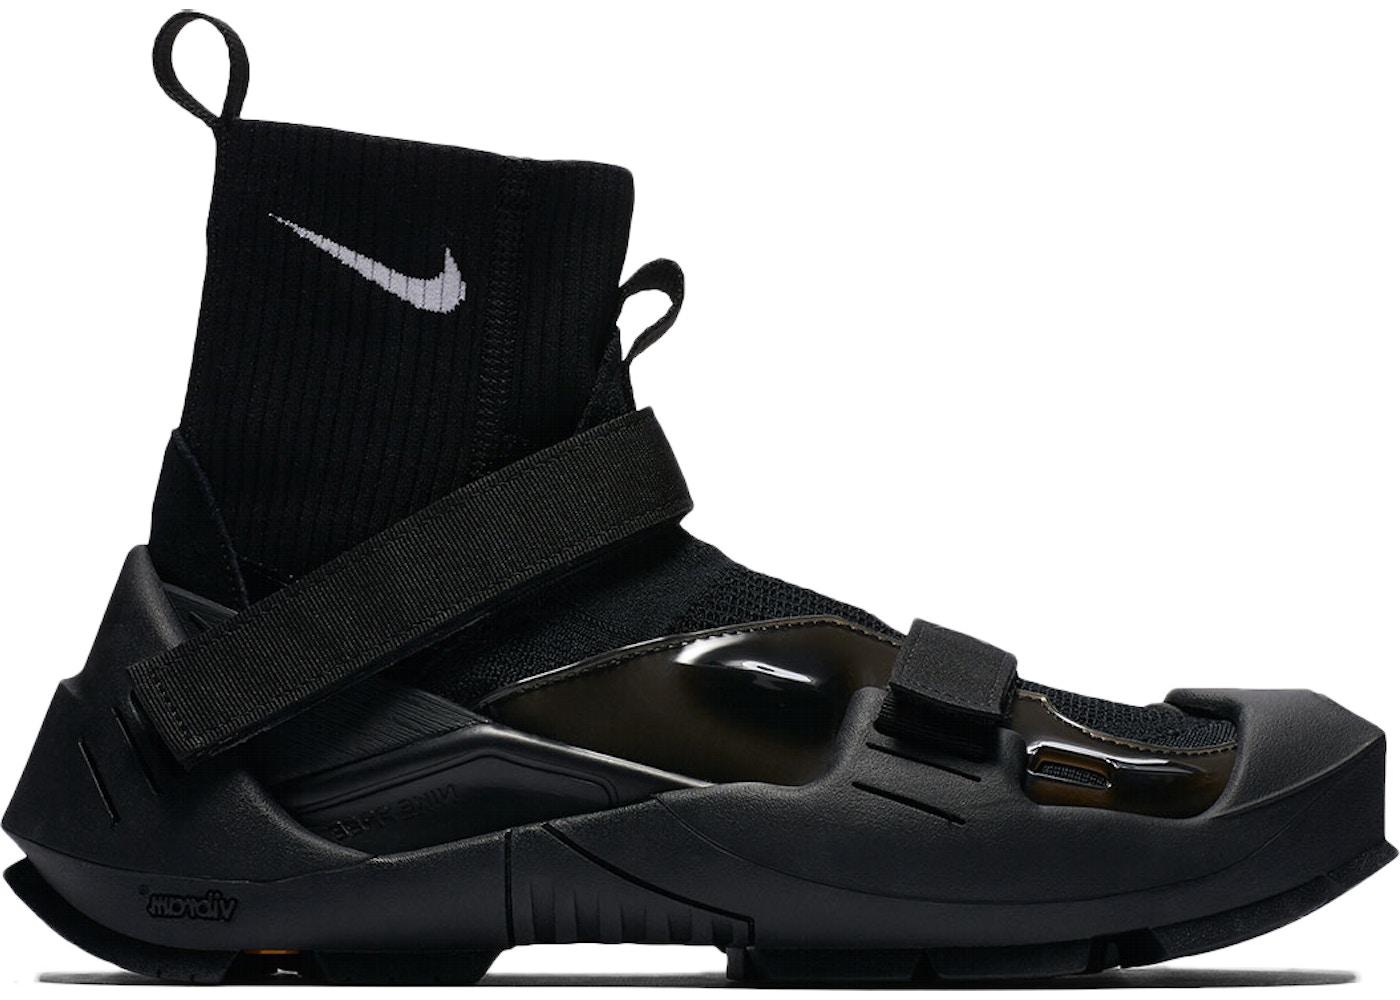 buy online f8e73 fa229 Nike Free TR 3 Flyknit SP MMW Black (W) - AQ9201-001